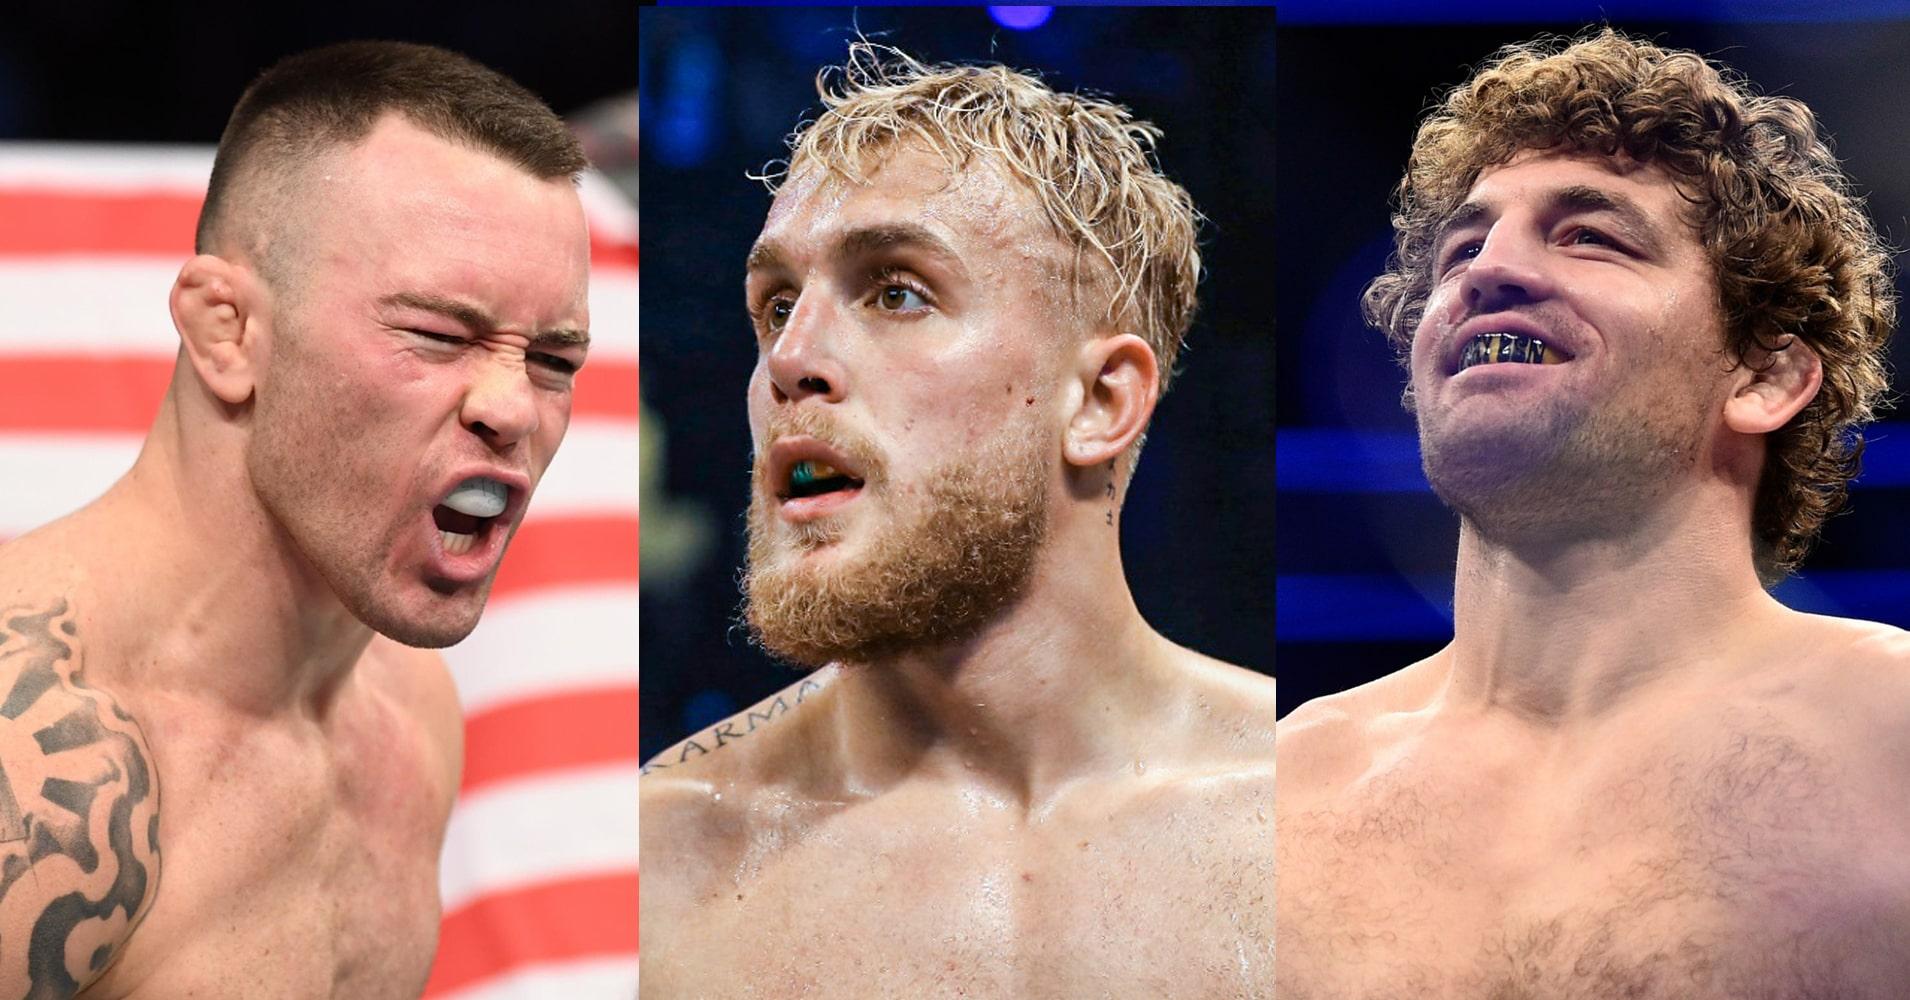 UFC: Colby Covington Makes His Jake Paul vs Ben Askren Prediction